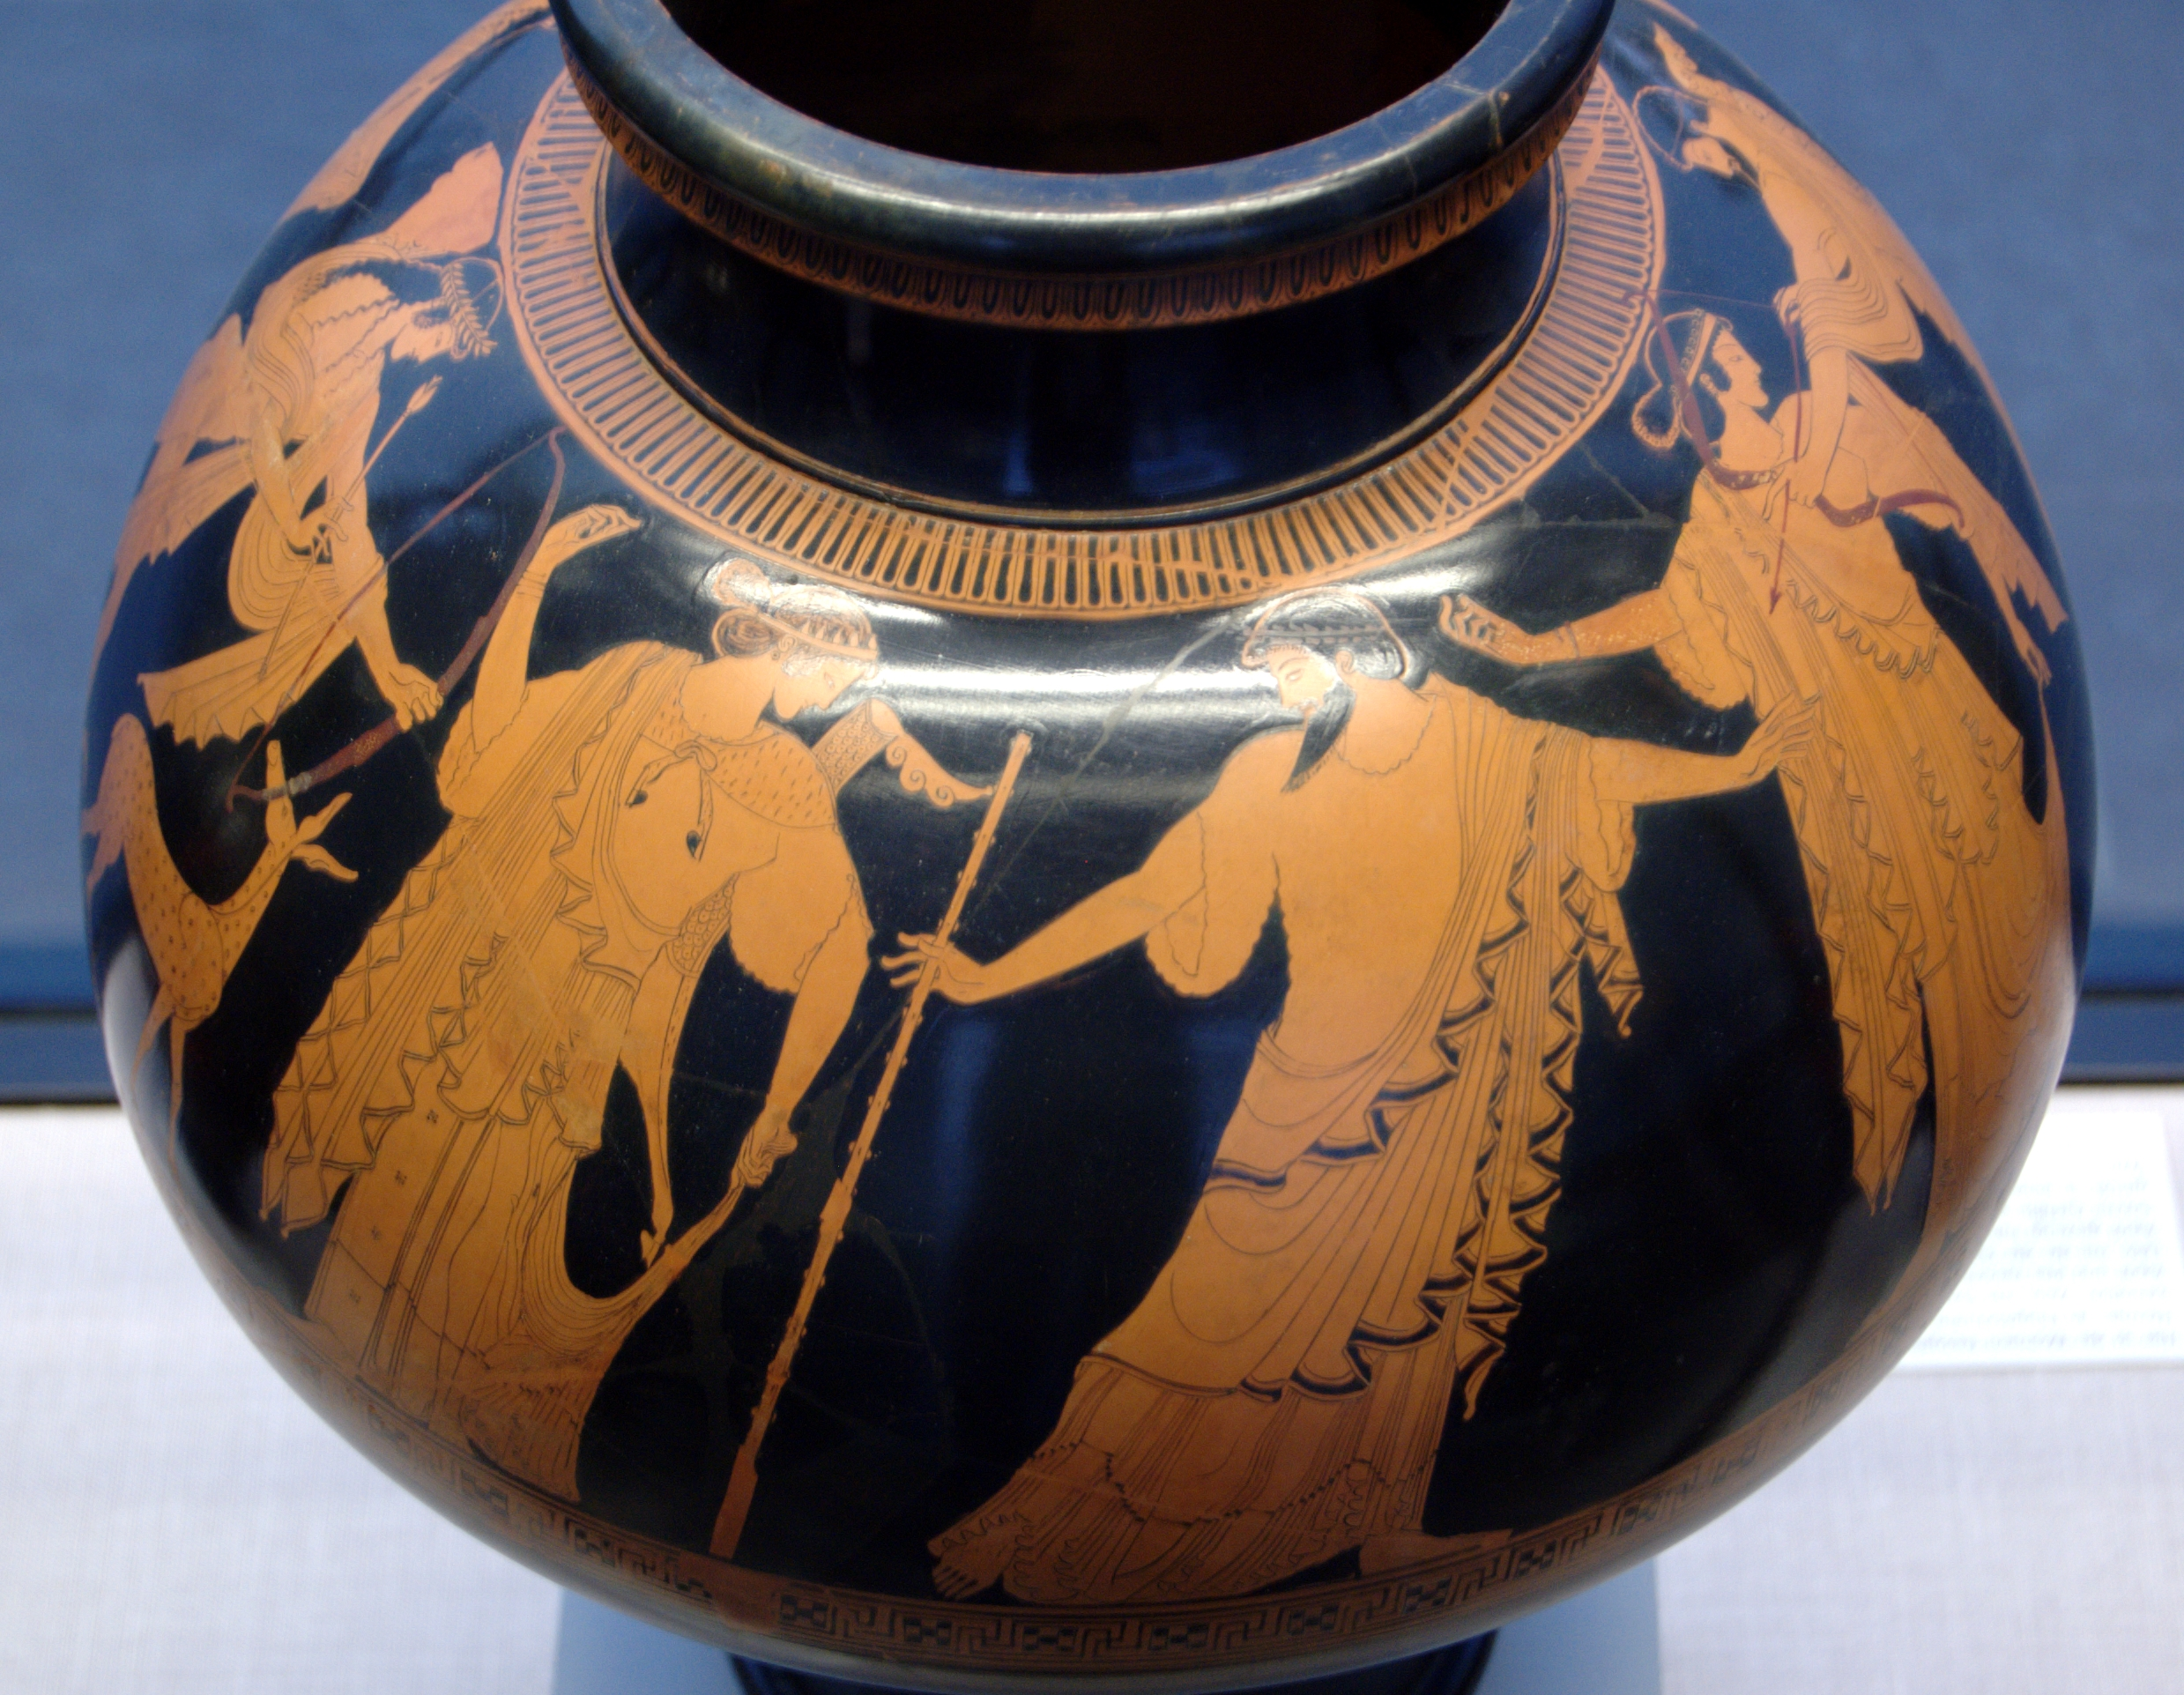 http://upload.wikimedia.org/wikipedia/commons/f/f5/Rape_Marpessa_Staatliche_Antikensammlungen_2417.jpg